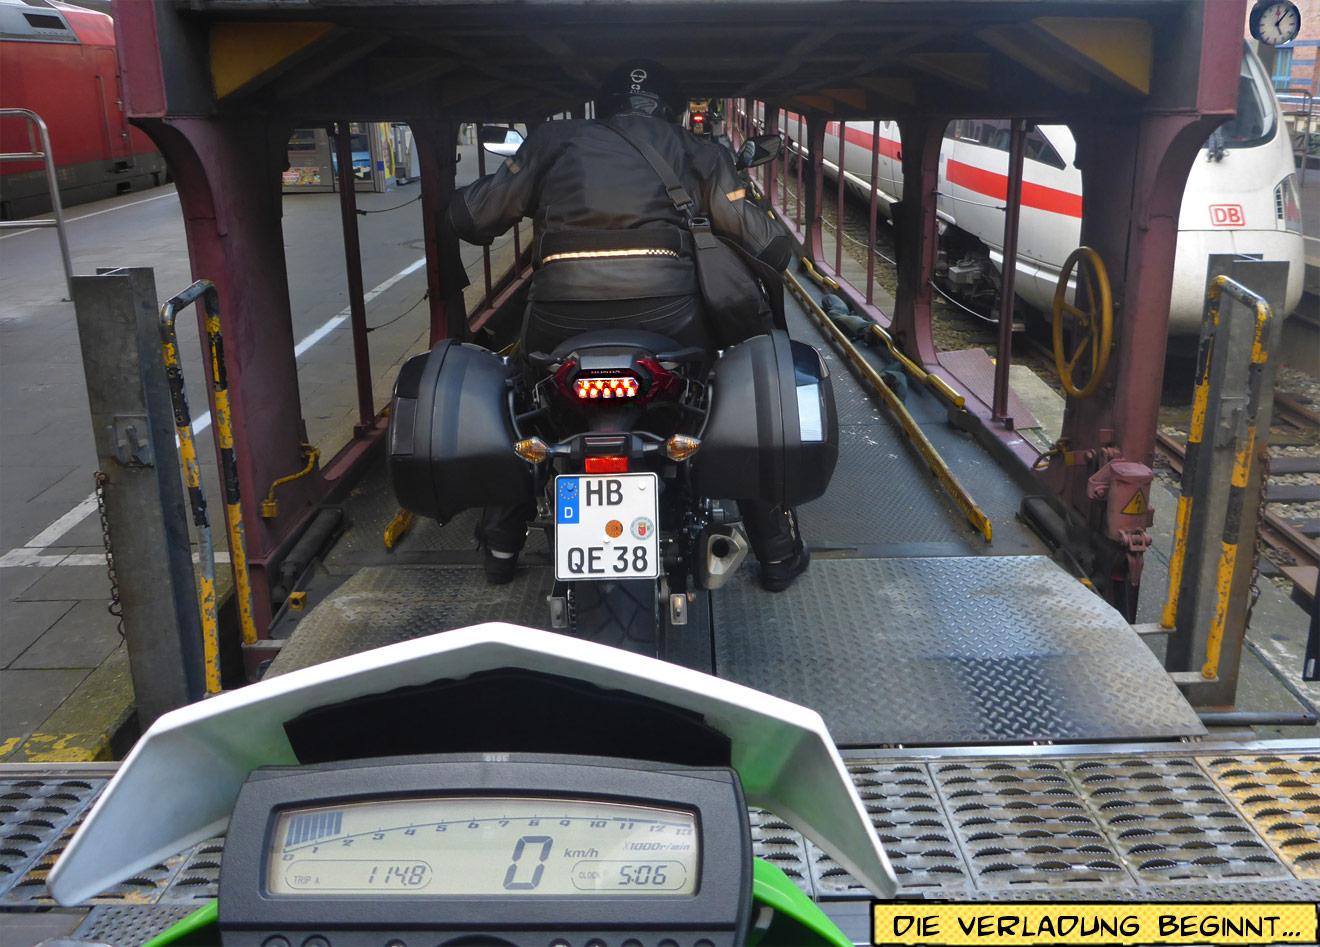 Motorrad Autozug Hamburg Altona Verladung